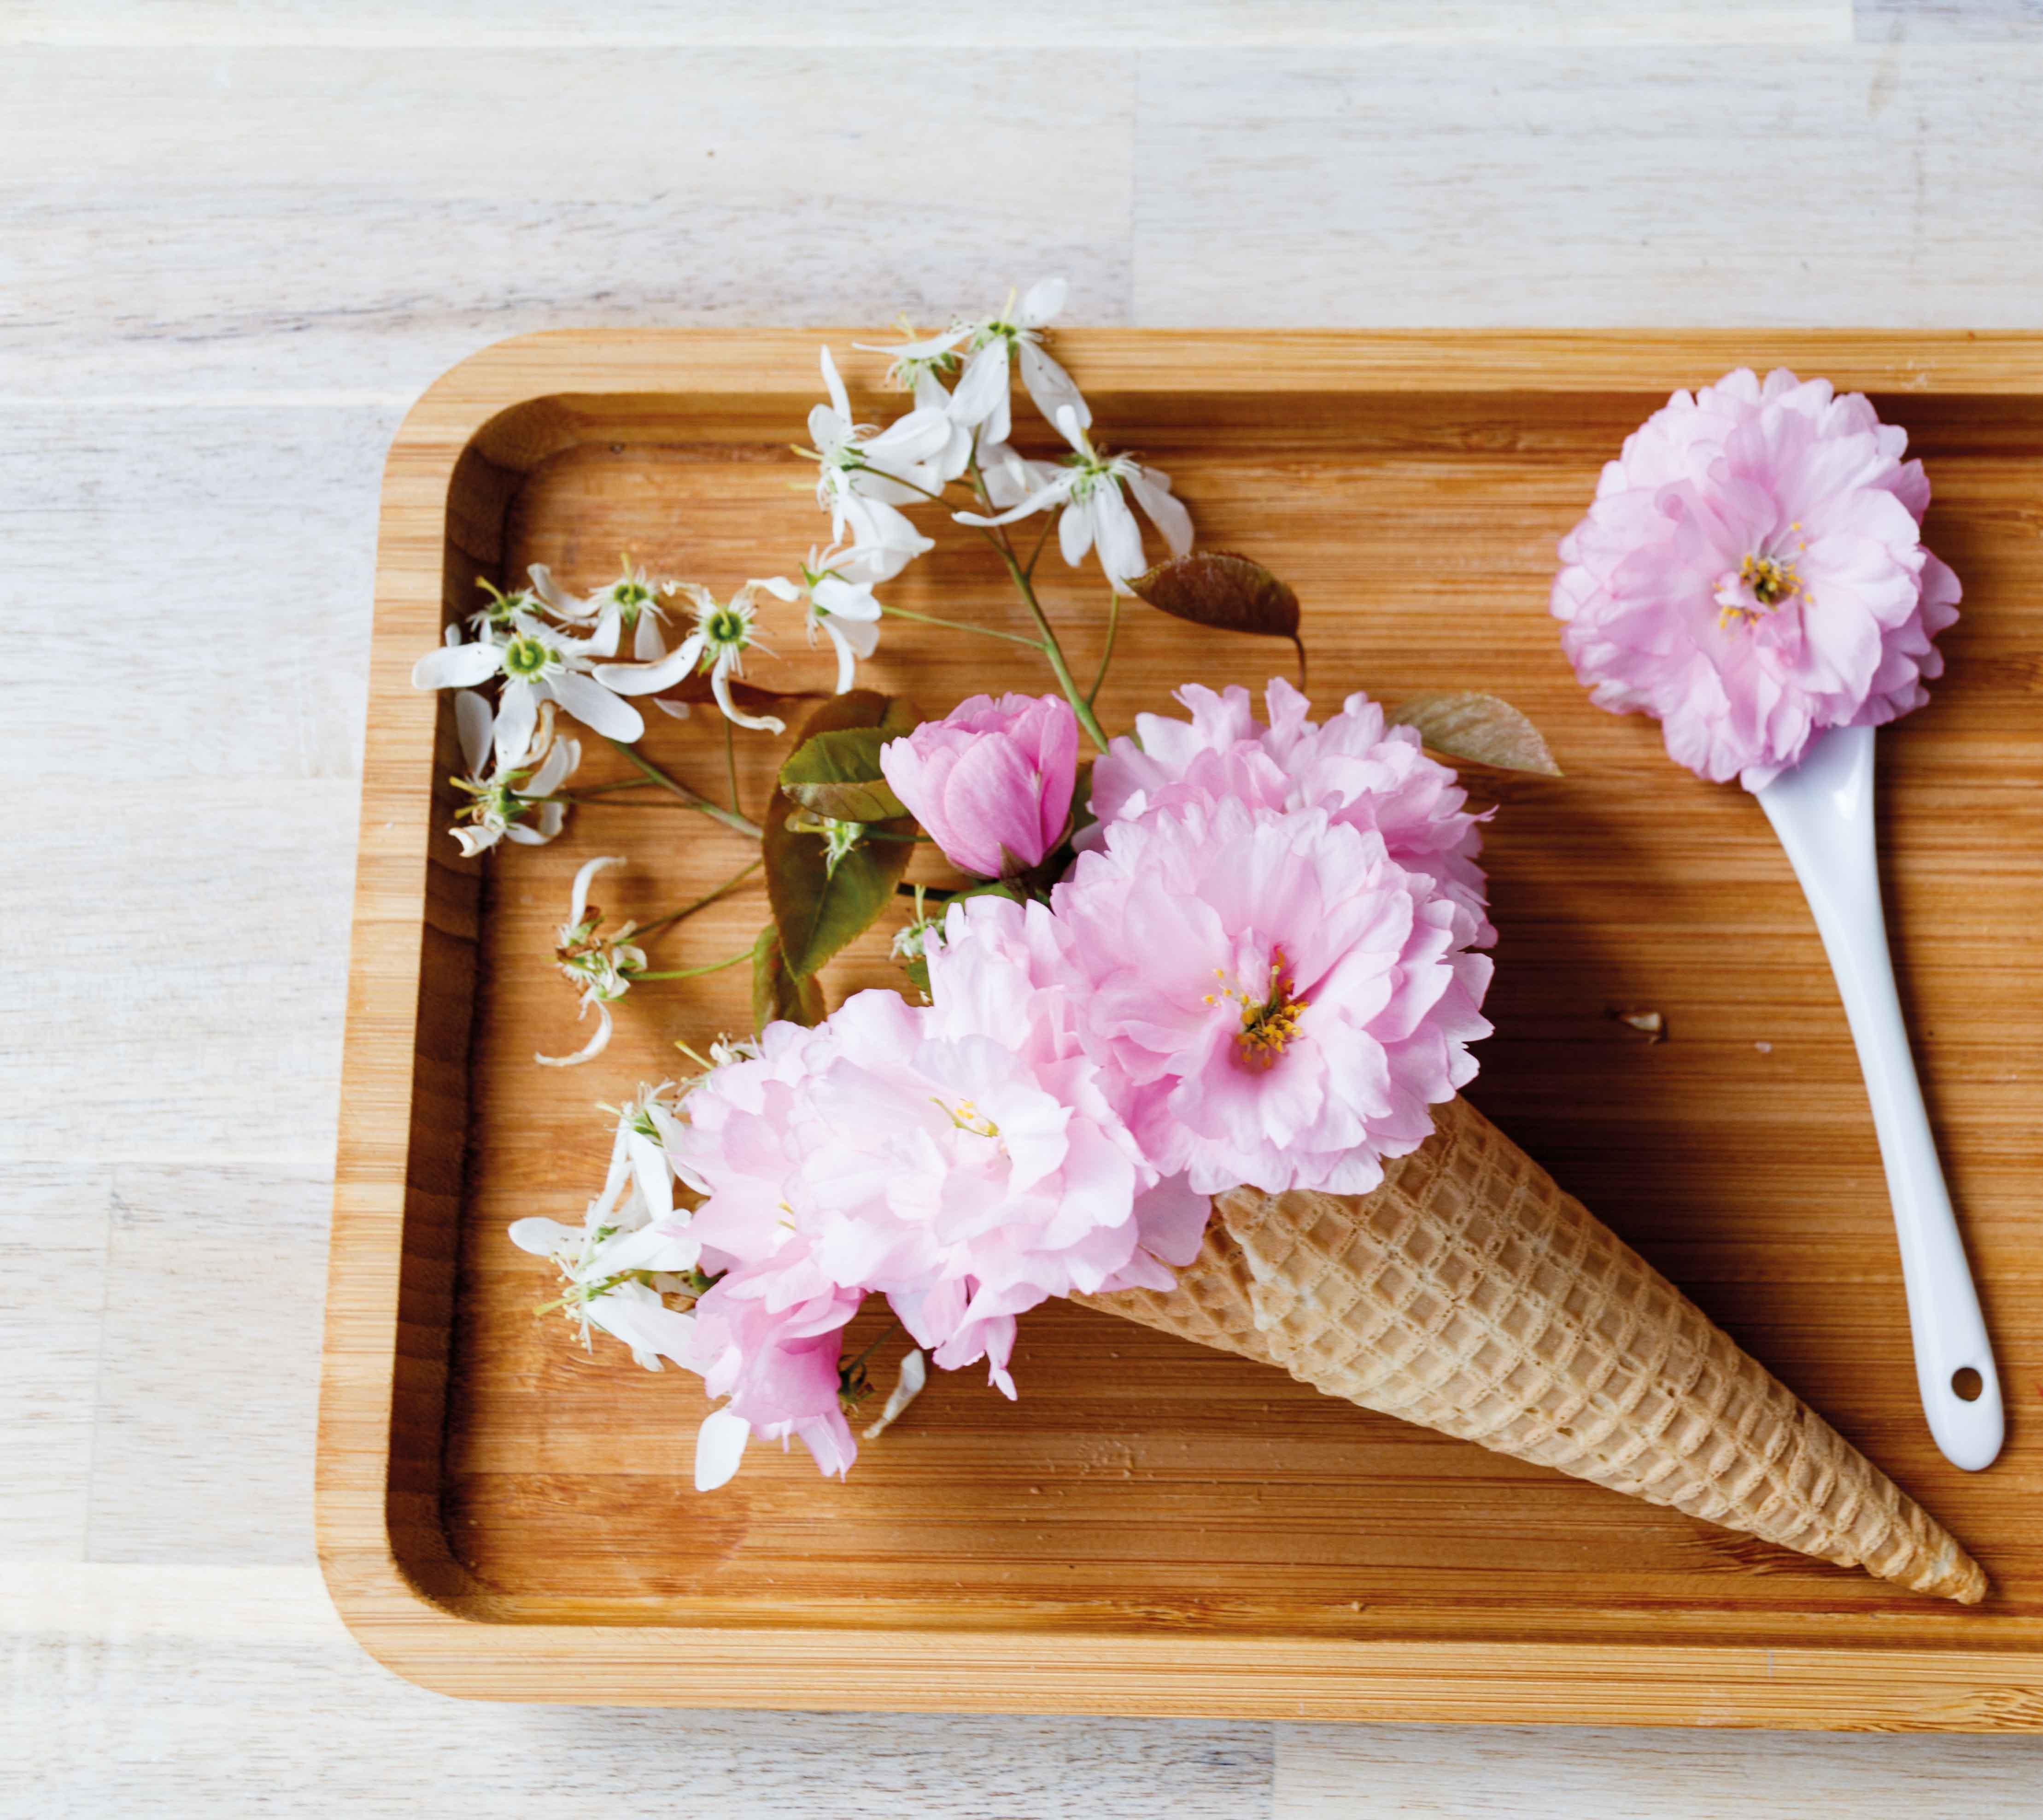 Himbeer-Cheesecake-Eis // Raspberry Cheesecake Icecream by http://babyrockmyday.com/himbeer-cheesecake-eis/